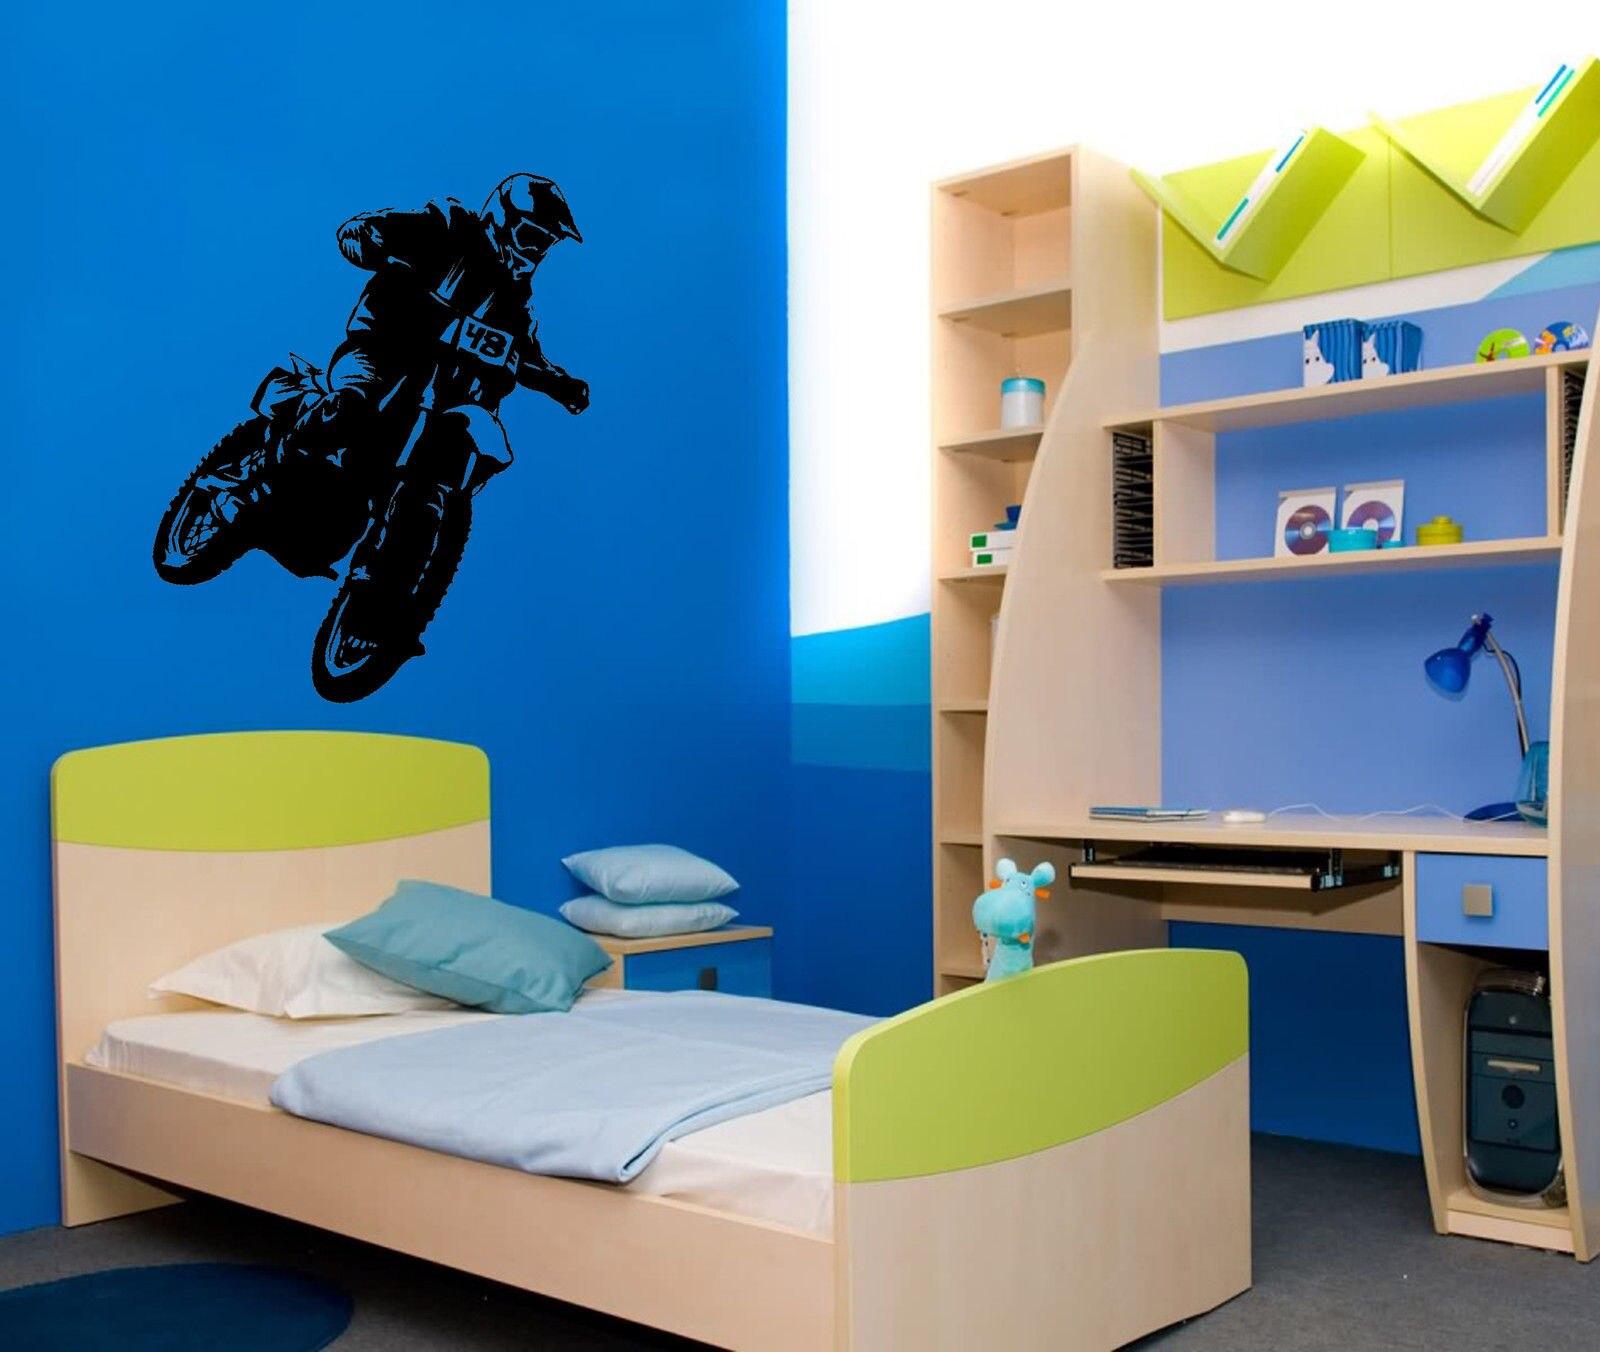 Motocross Bedroom Decor Online Buy Wholesale Motocross Wall Murals From China Motocross